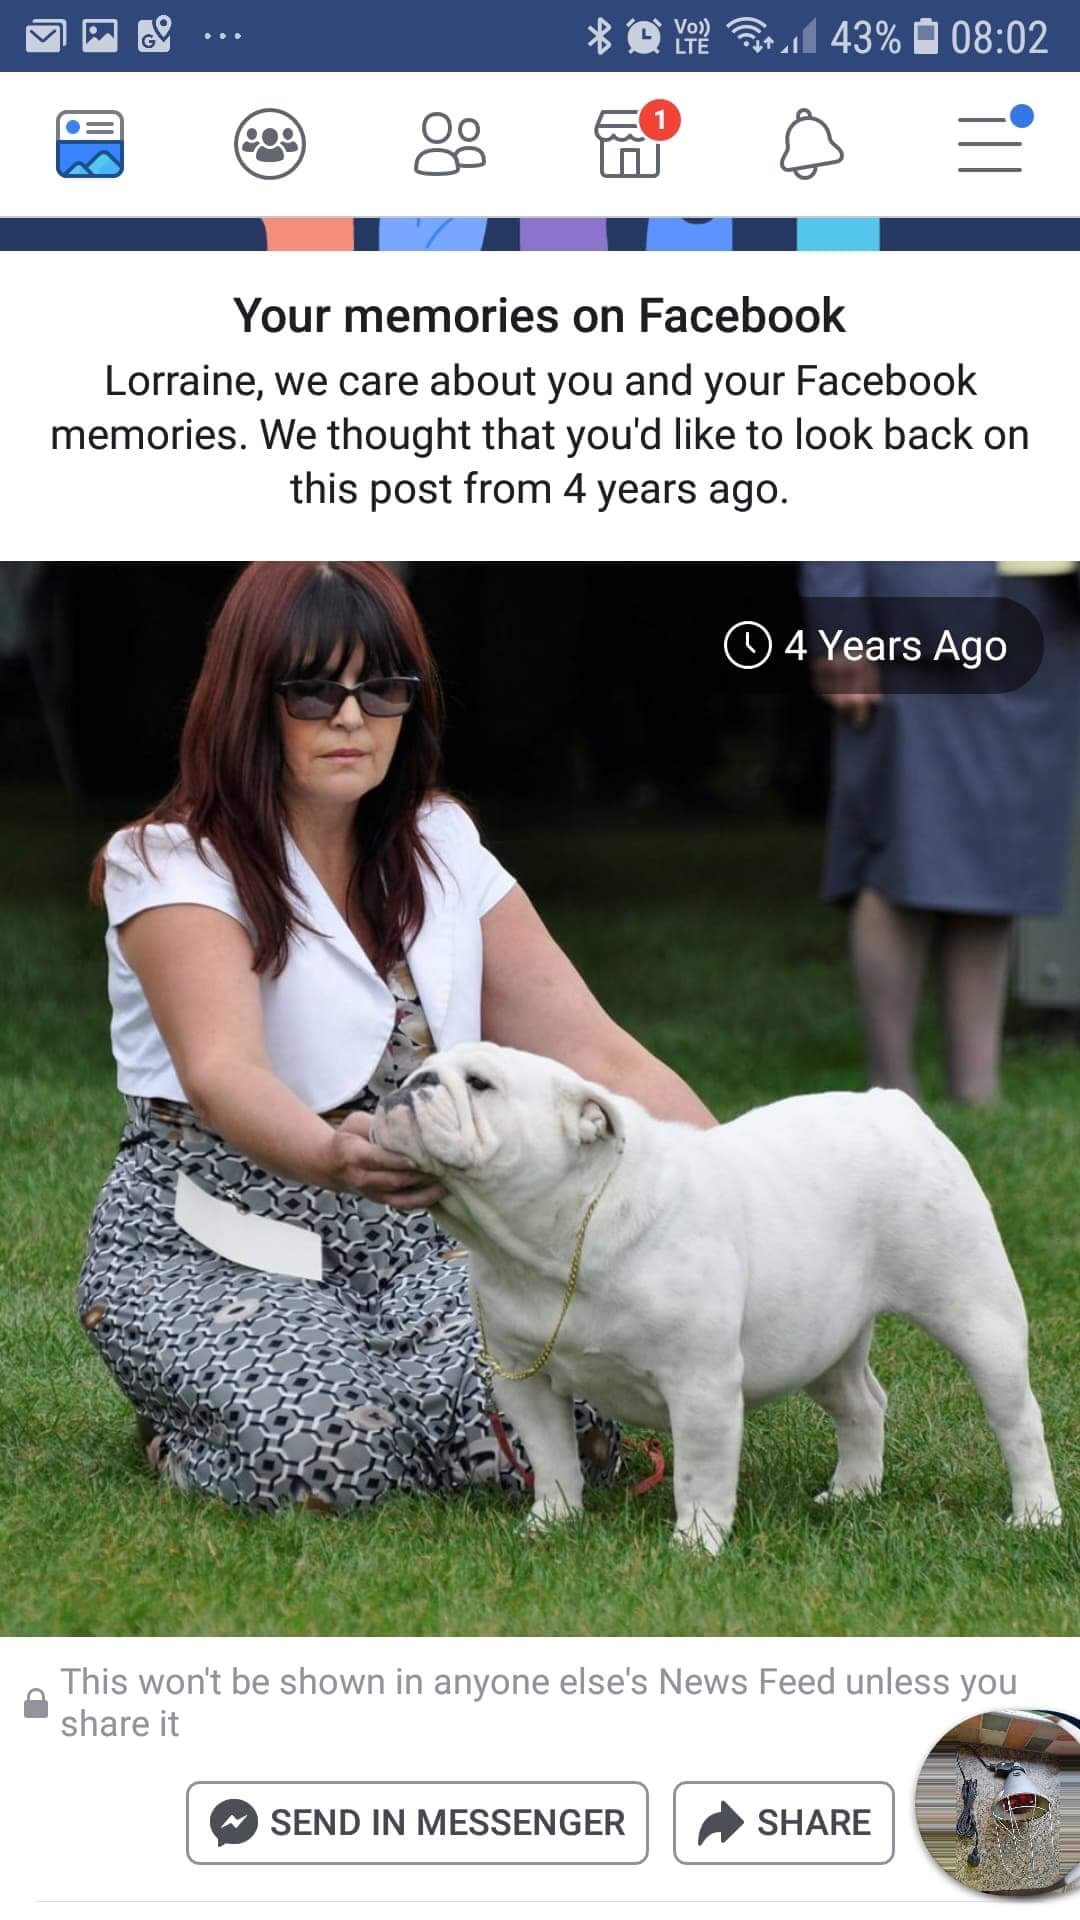 Collectibulldogs